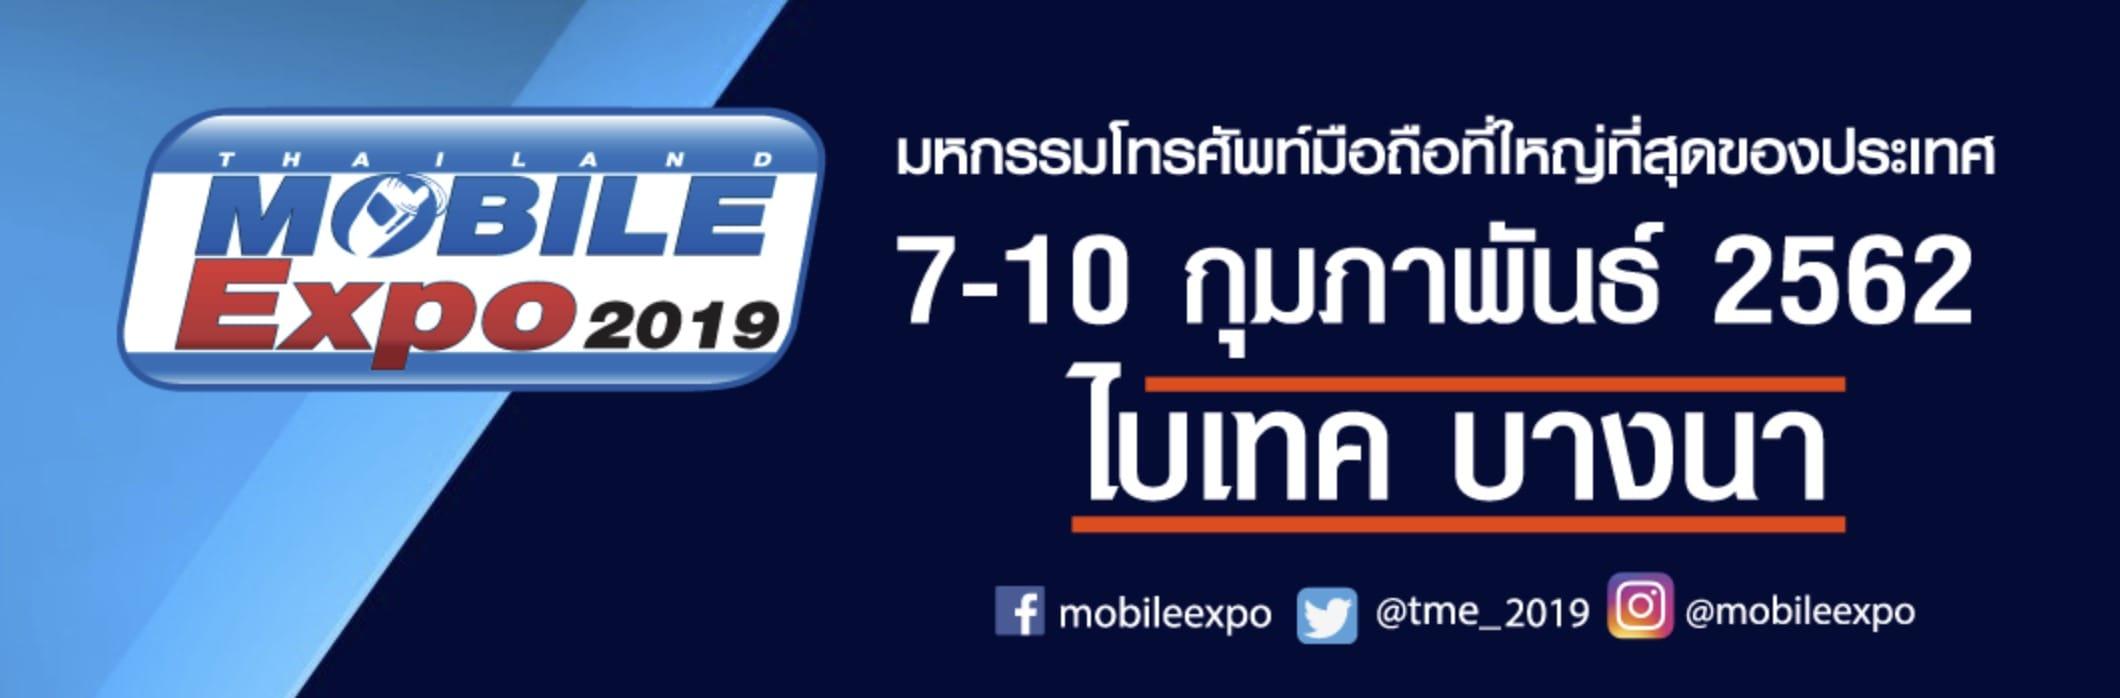 Thailand Mobile Expo 2019 Banner